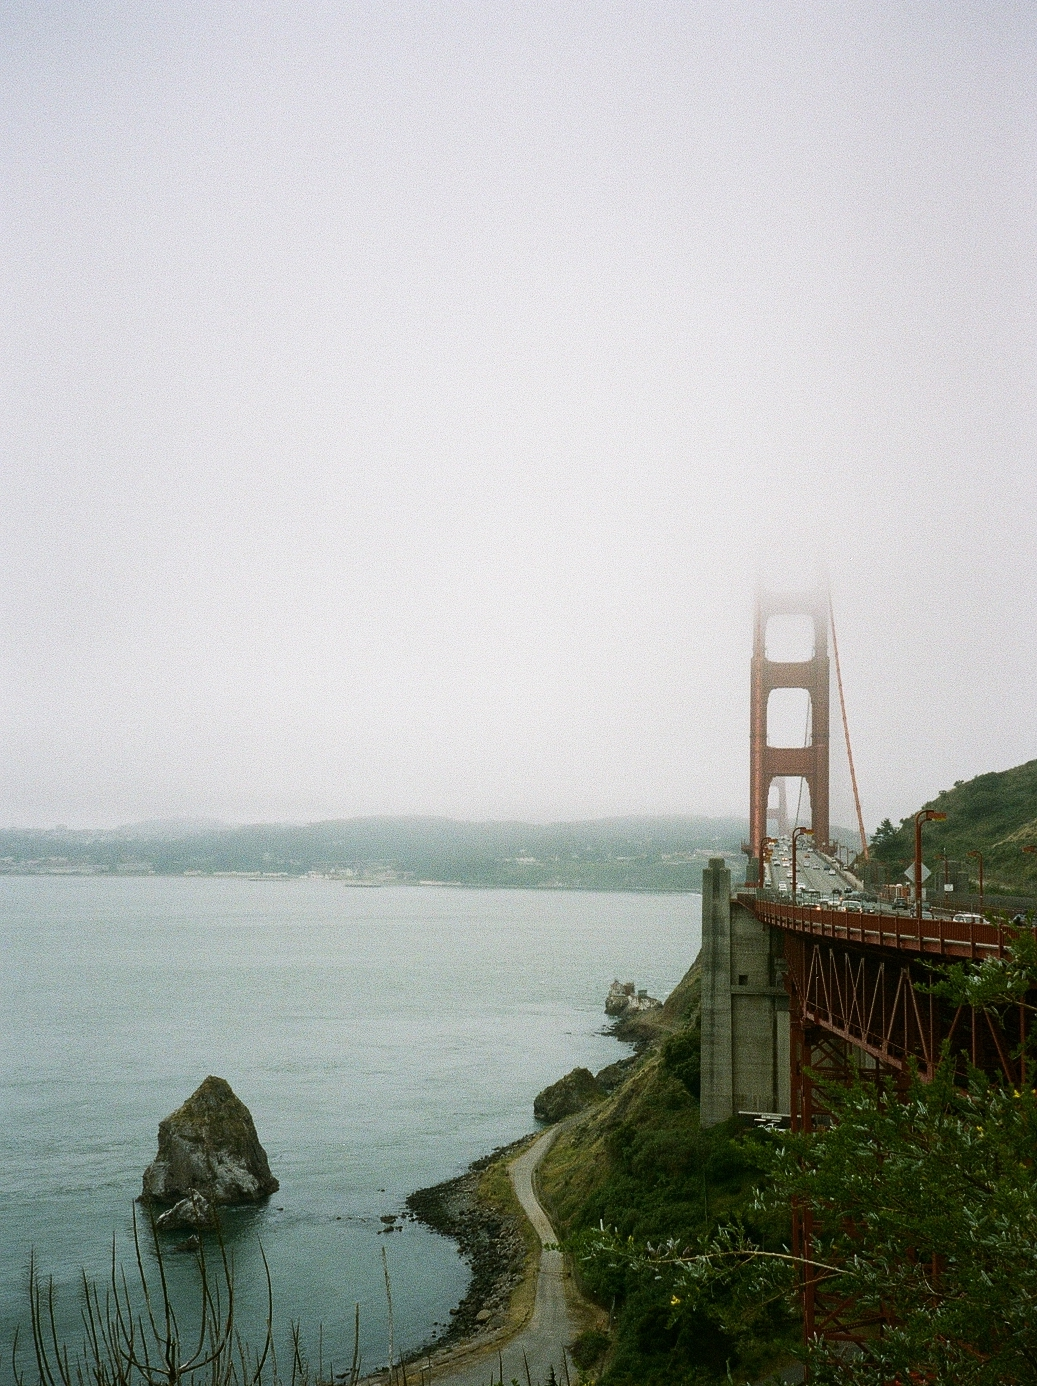 San Francisco Bridge film photo on a foggy day